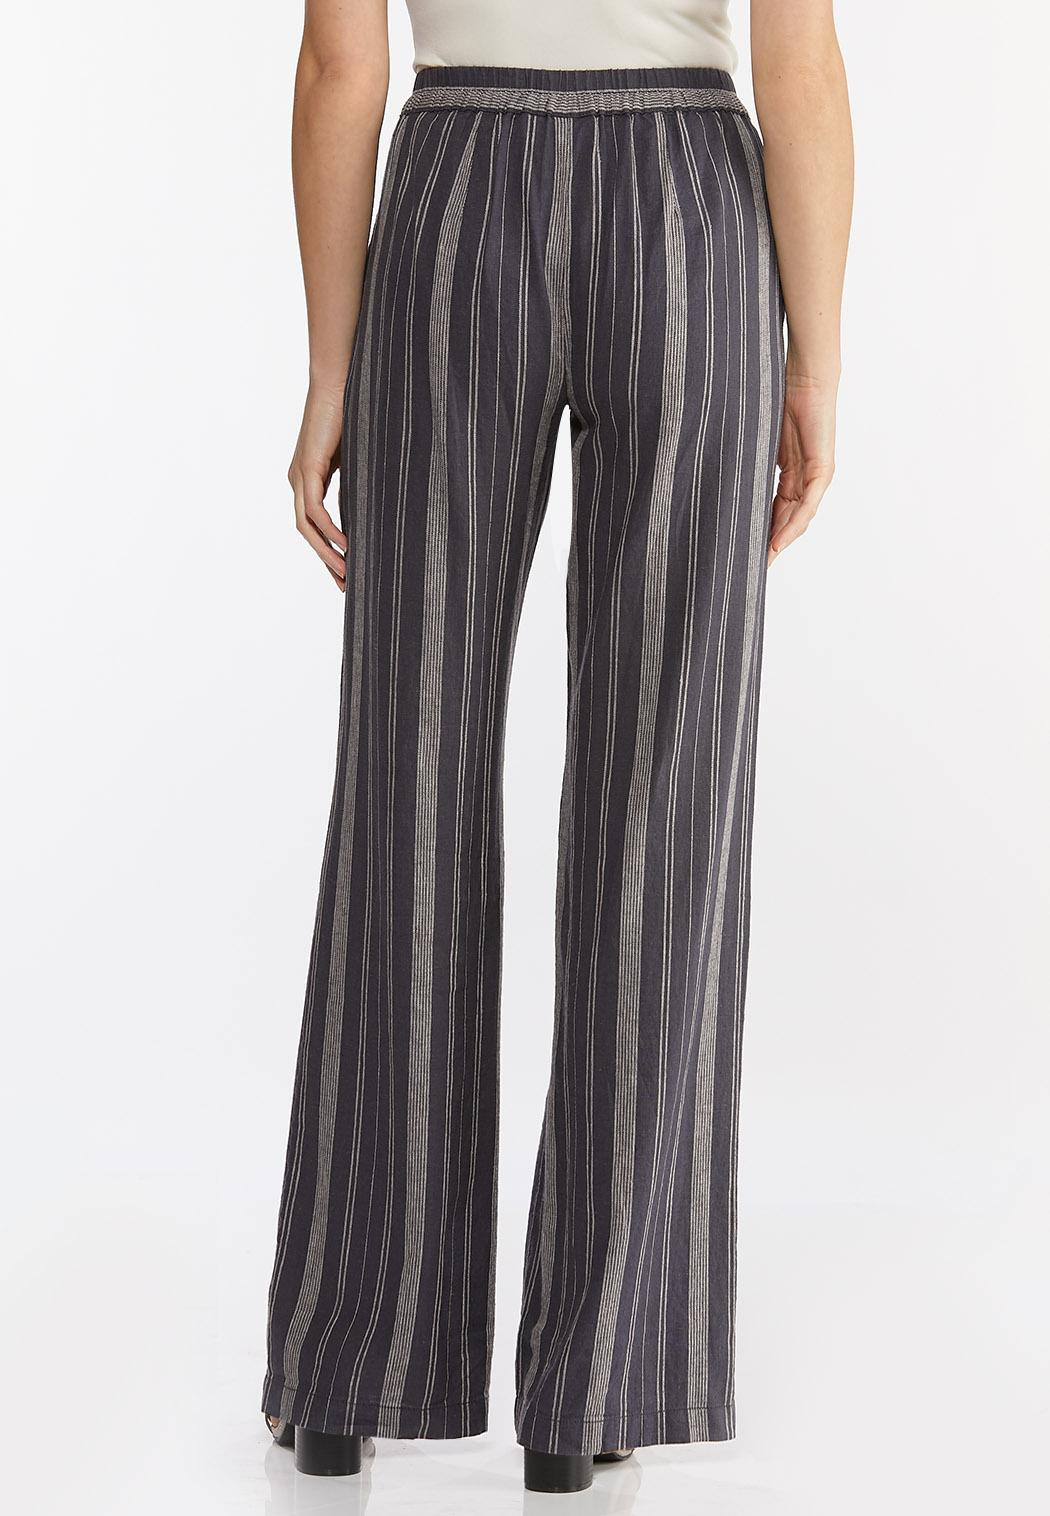 Stripe Linen Pants (Item #44456805)